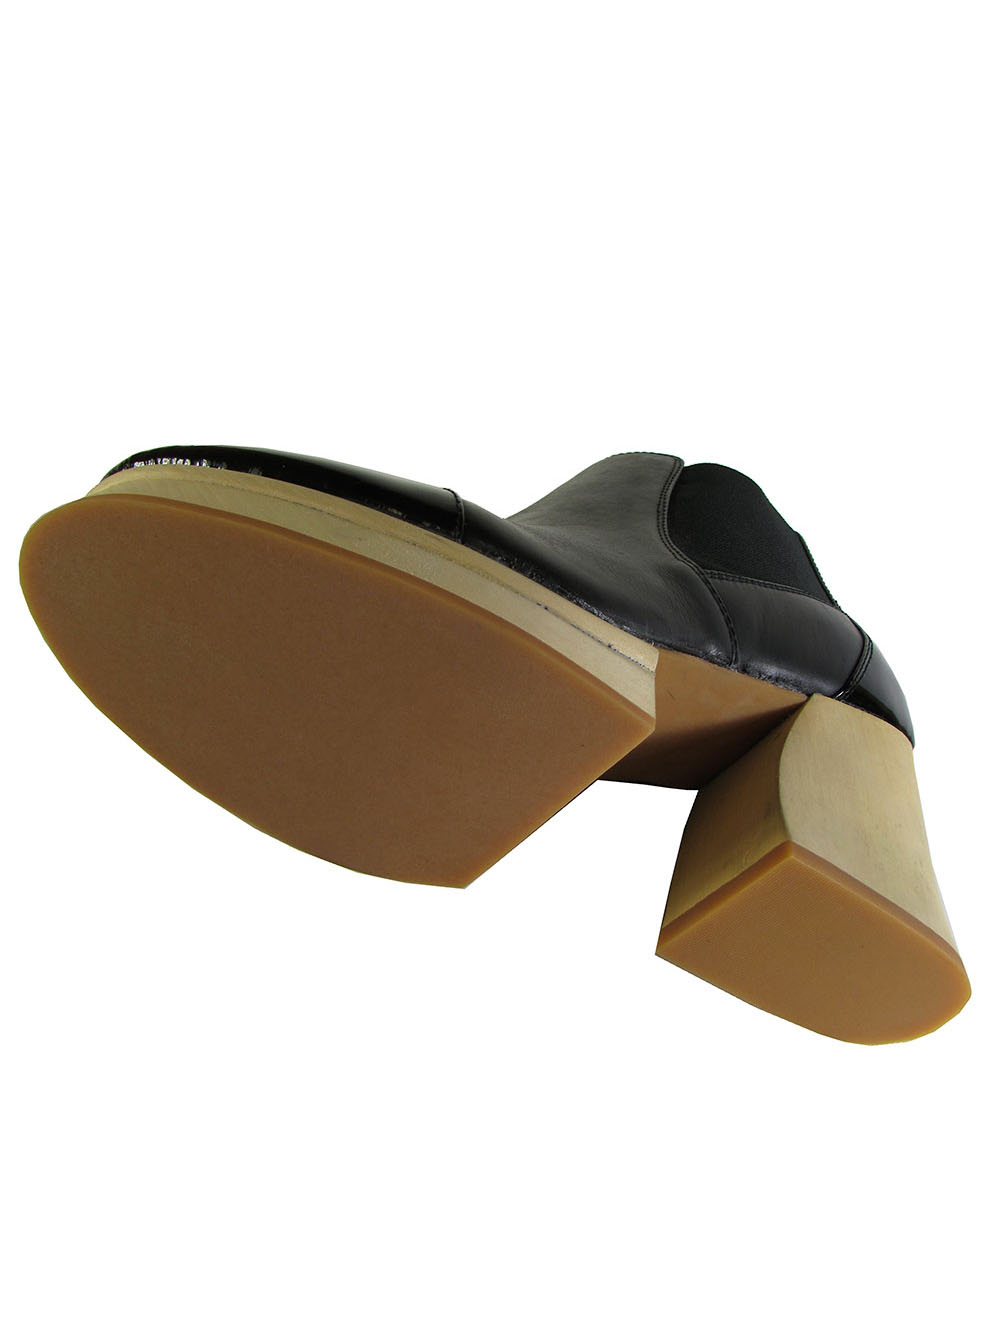 Jeffrey Campbell Womens Safara Ankle Bootie Shoe